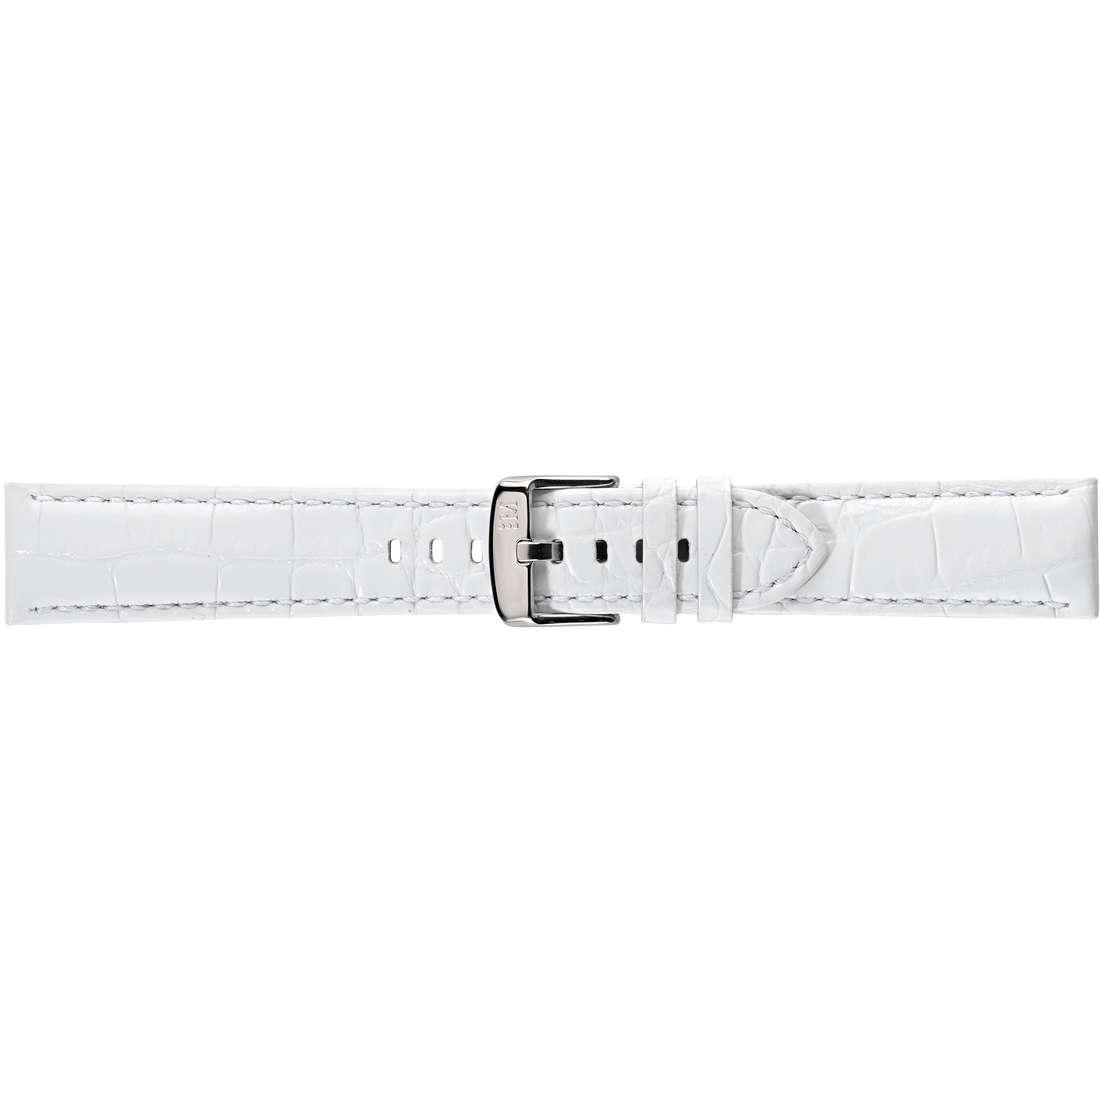 watch watch bands watch straps man Morellato Performance A01X3555990017CR22